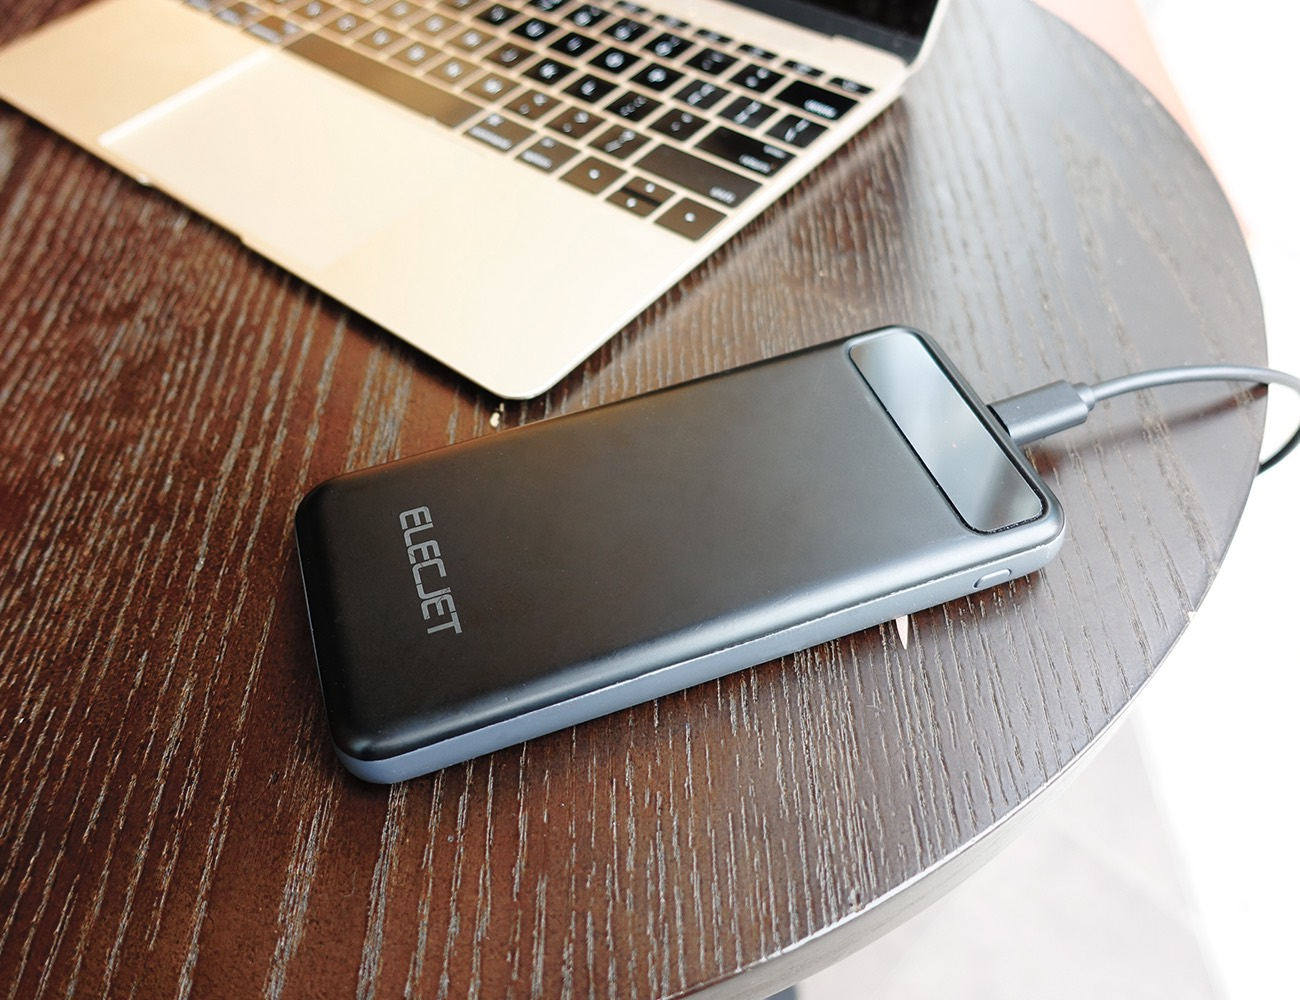 apollo ultra fast graphene power pack gadget flow. Black Bedroom Furniture Sets. Home Design Ideas